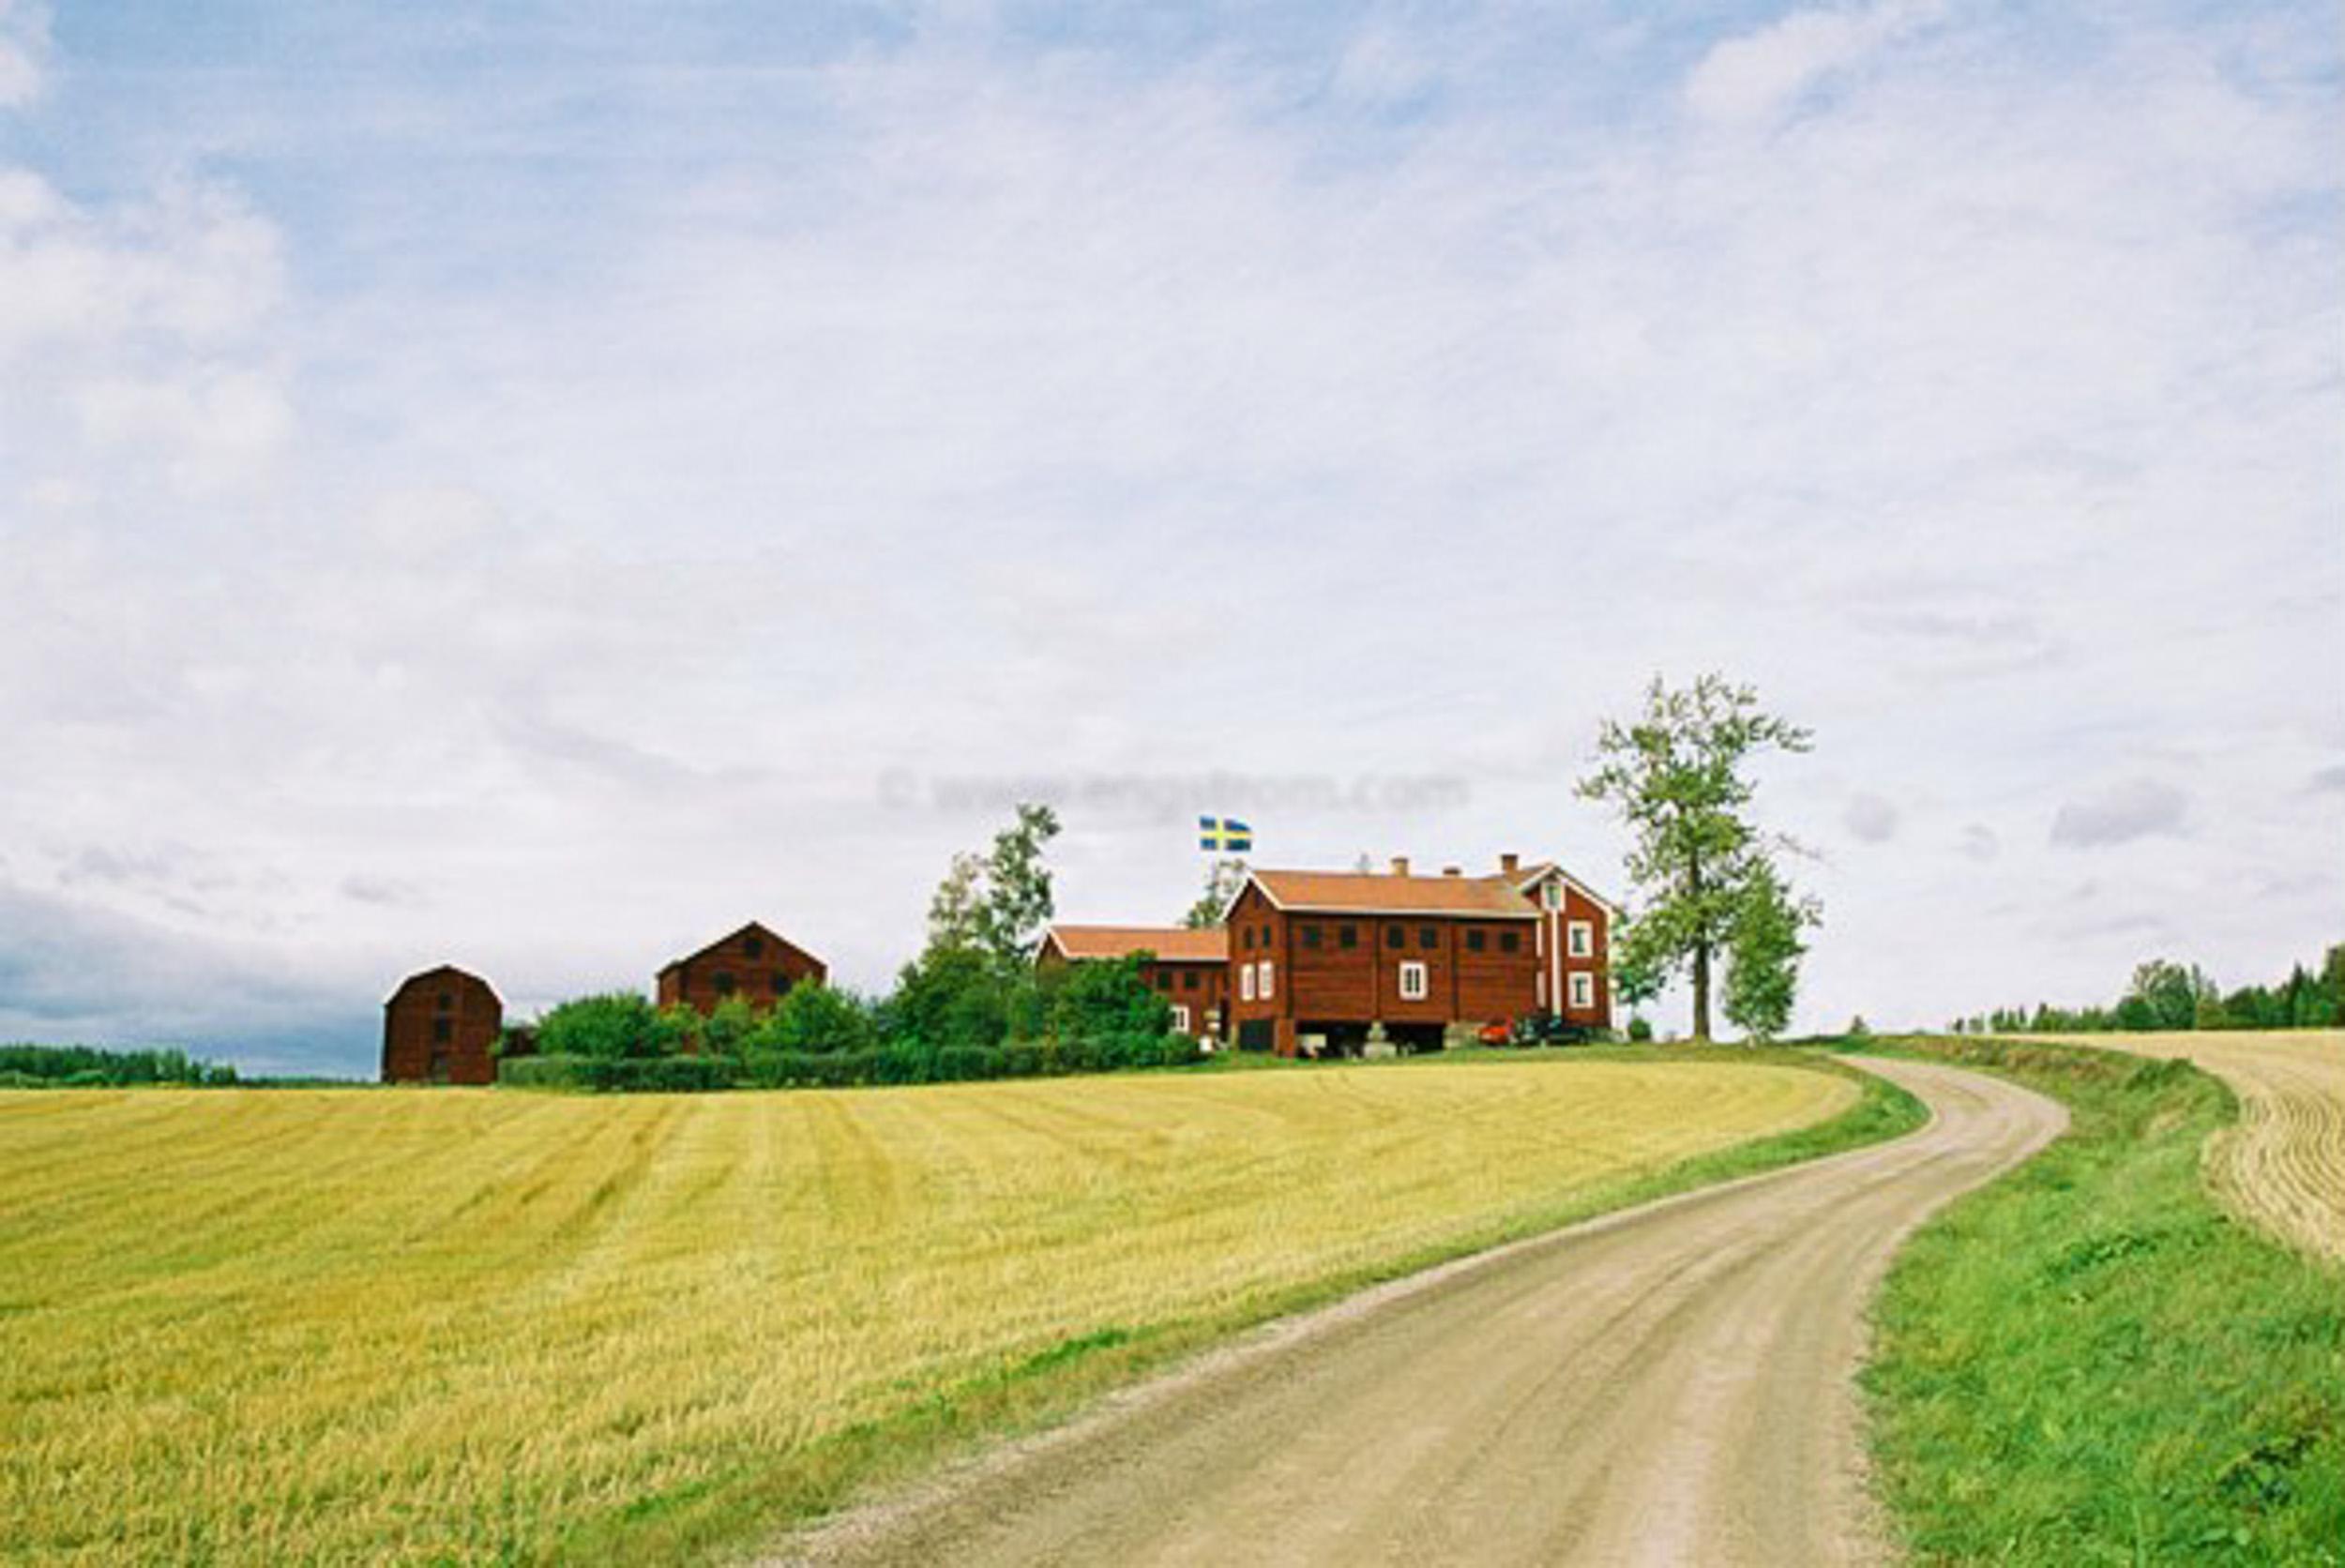 JE0425_177, Hälsingegård i Delsbo, Jonas Engström